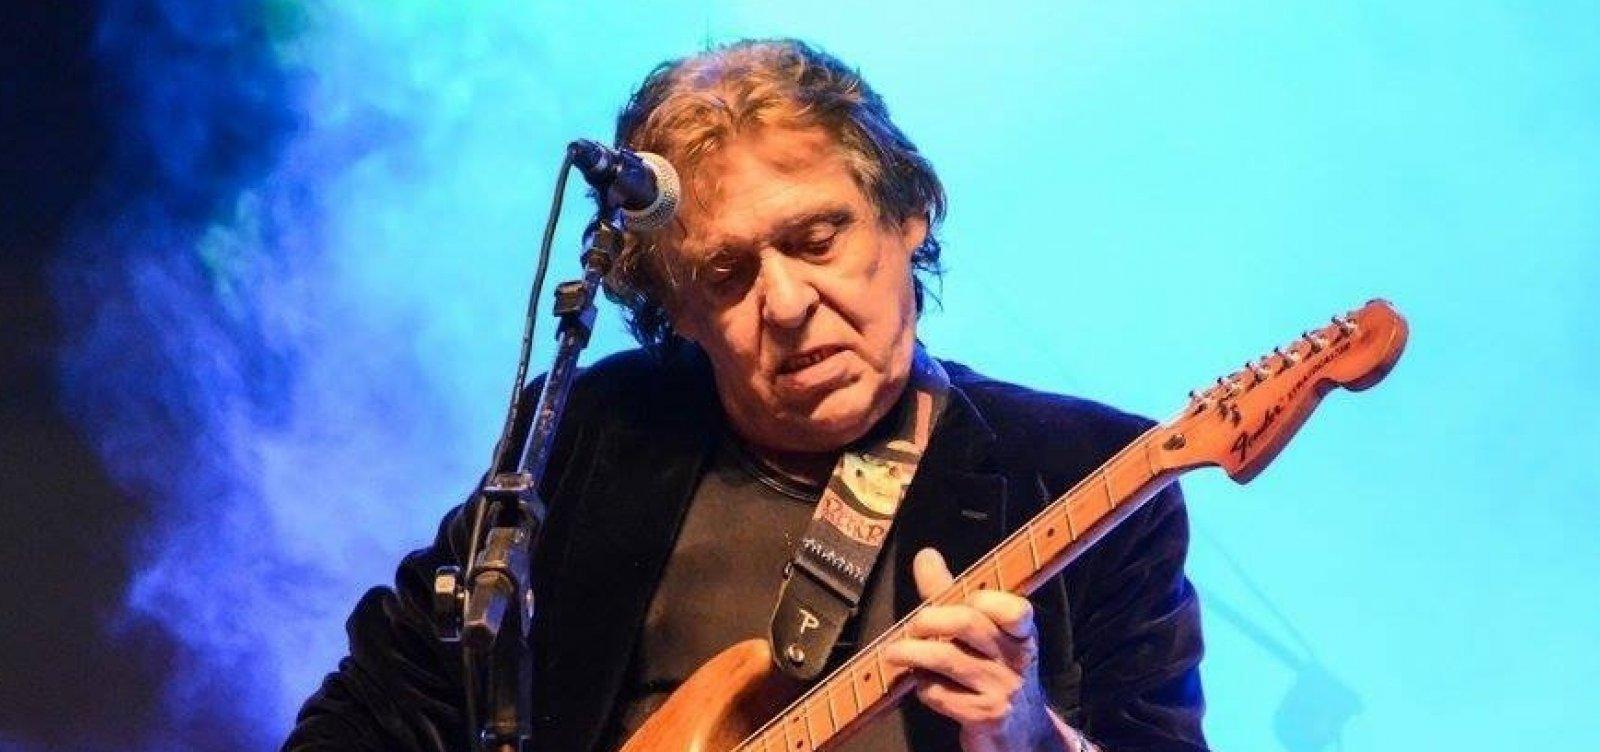 [Morre Renato Barros, vocalista da banda Renato e Seus Blue Caps, aos 76 anos]